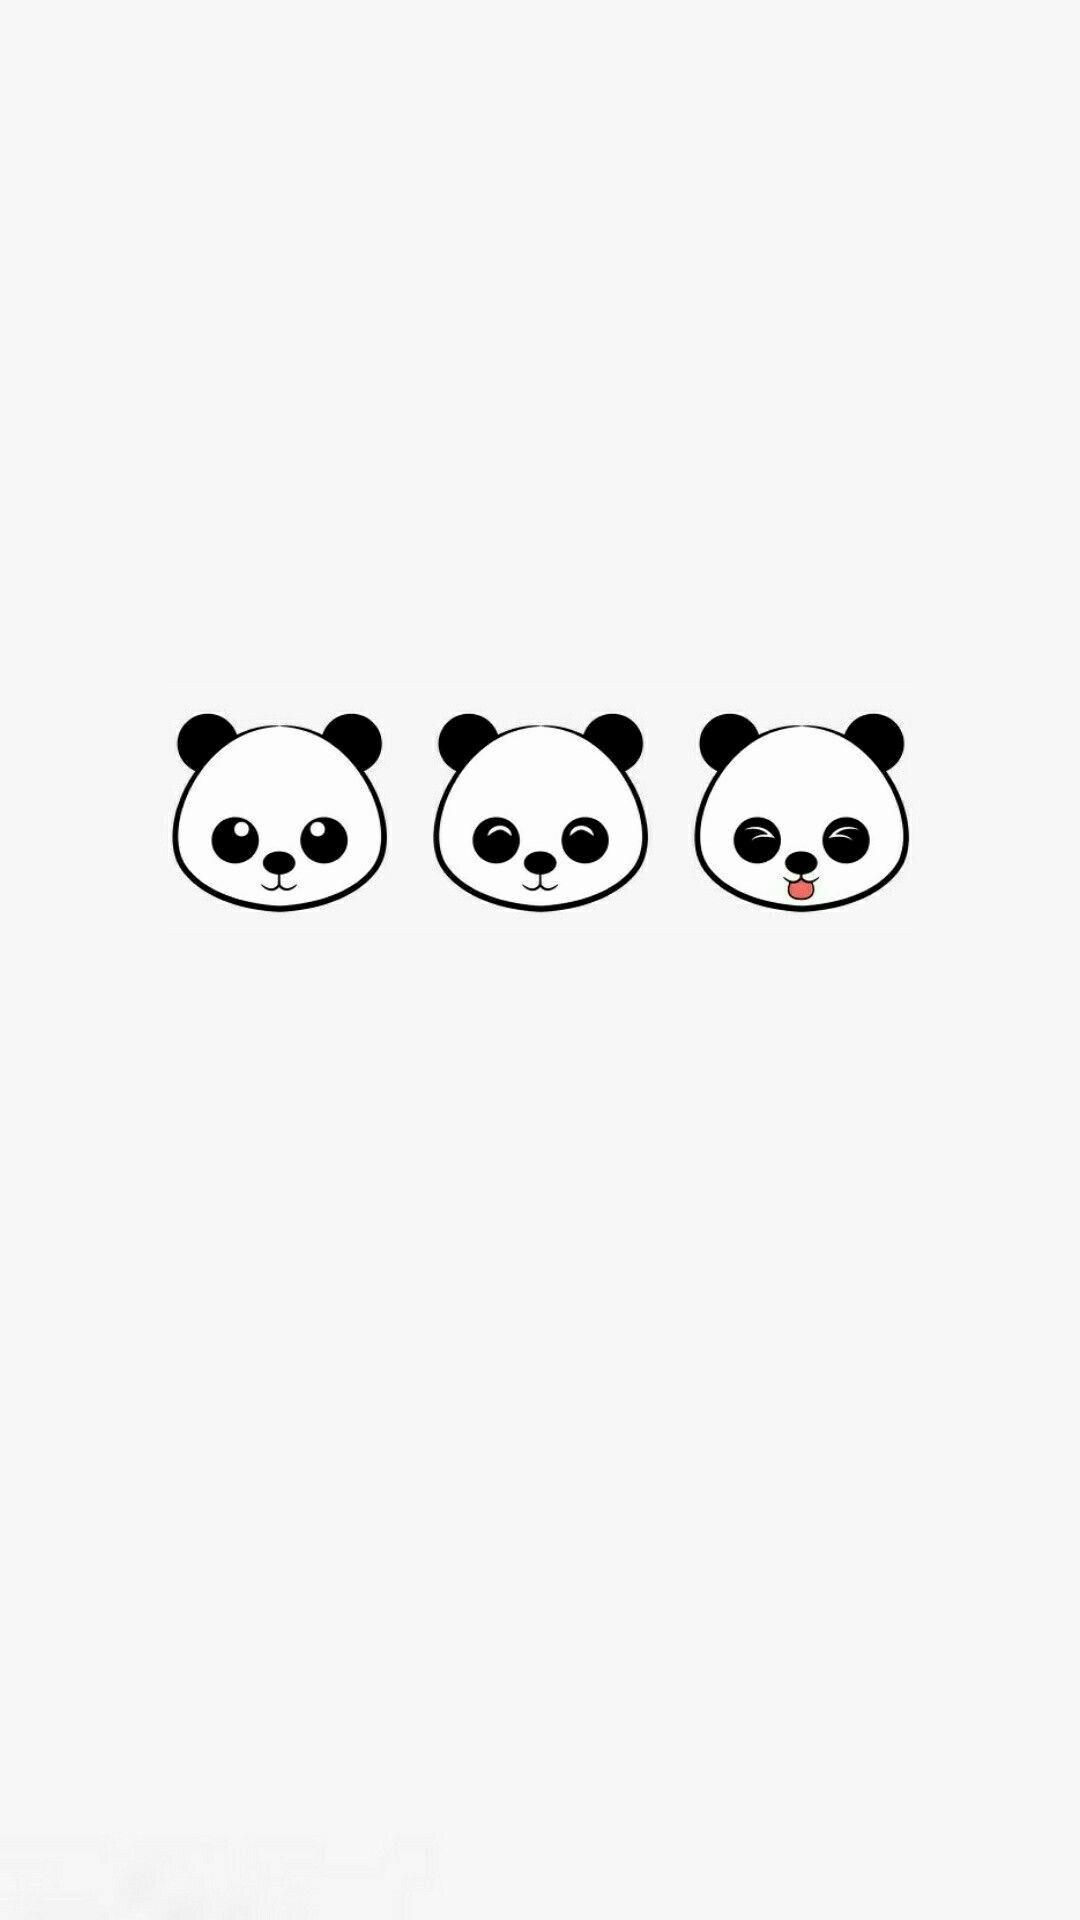 Wallpaper Of Pandas Posted By John Walker